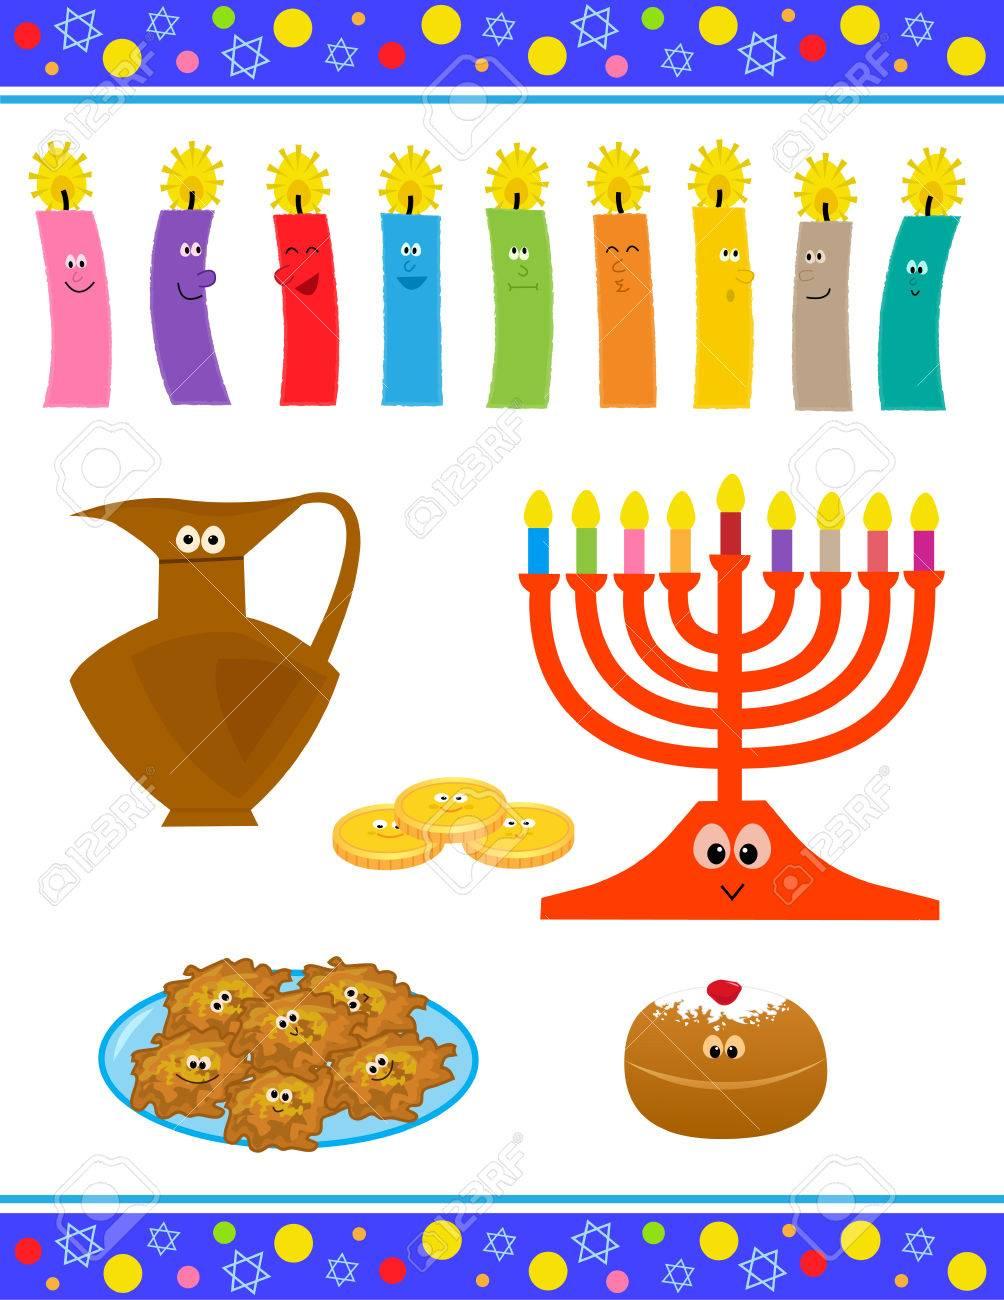 Cheerful Cartoon Set Of Hanukkah Symbols With Cute Faces Royalty